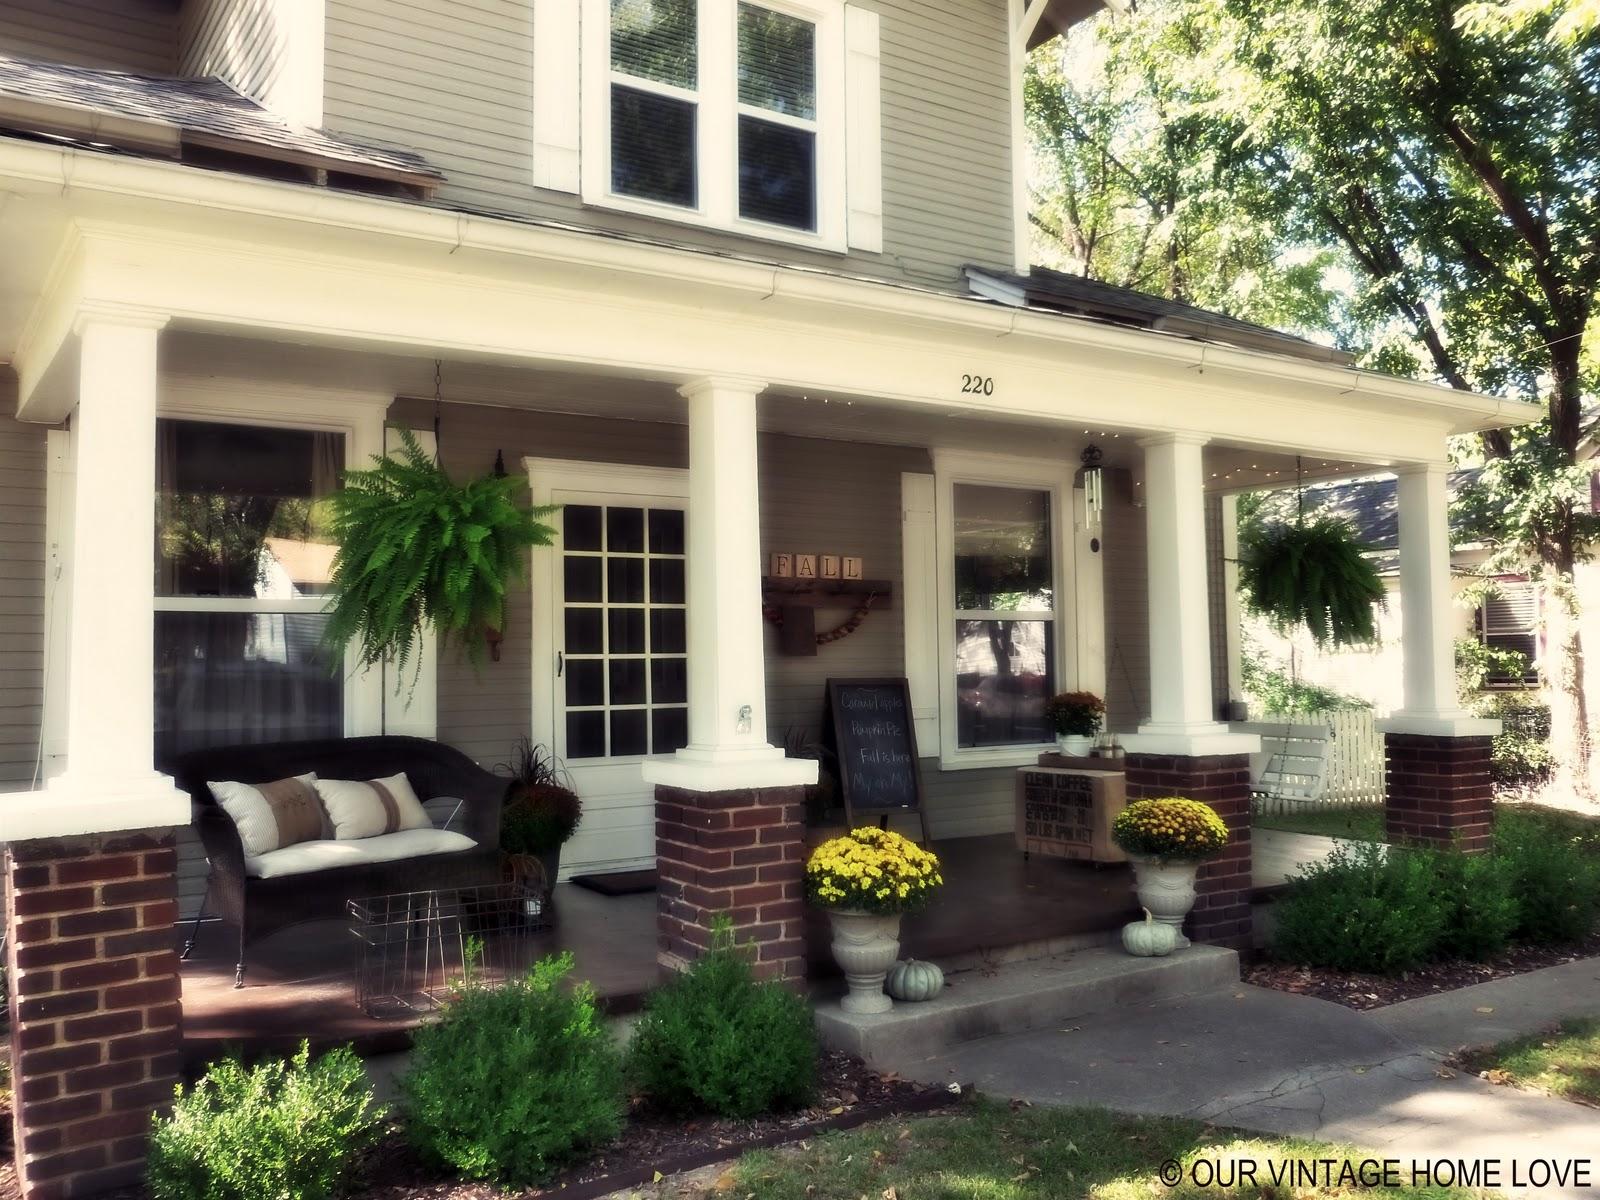 Our Vintage Home Love   Blogspot